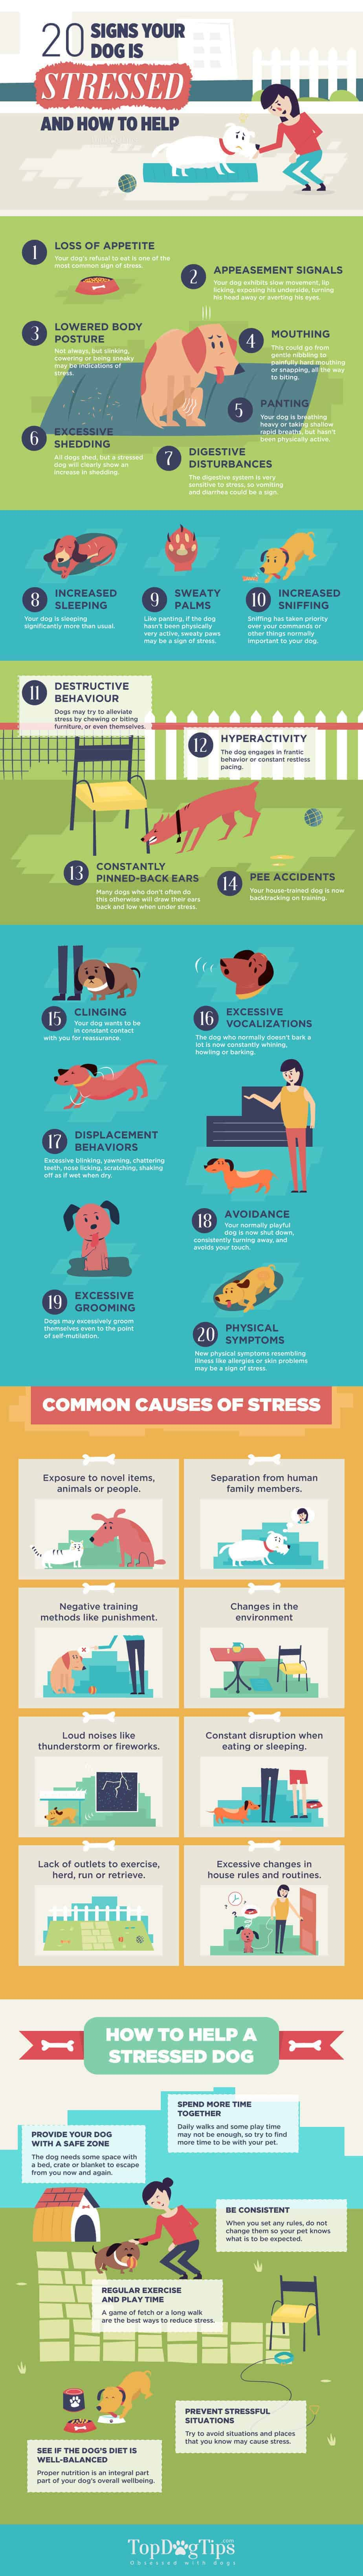 dog stress warning signs graphic